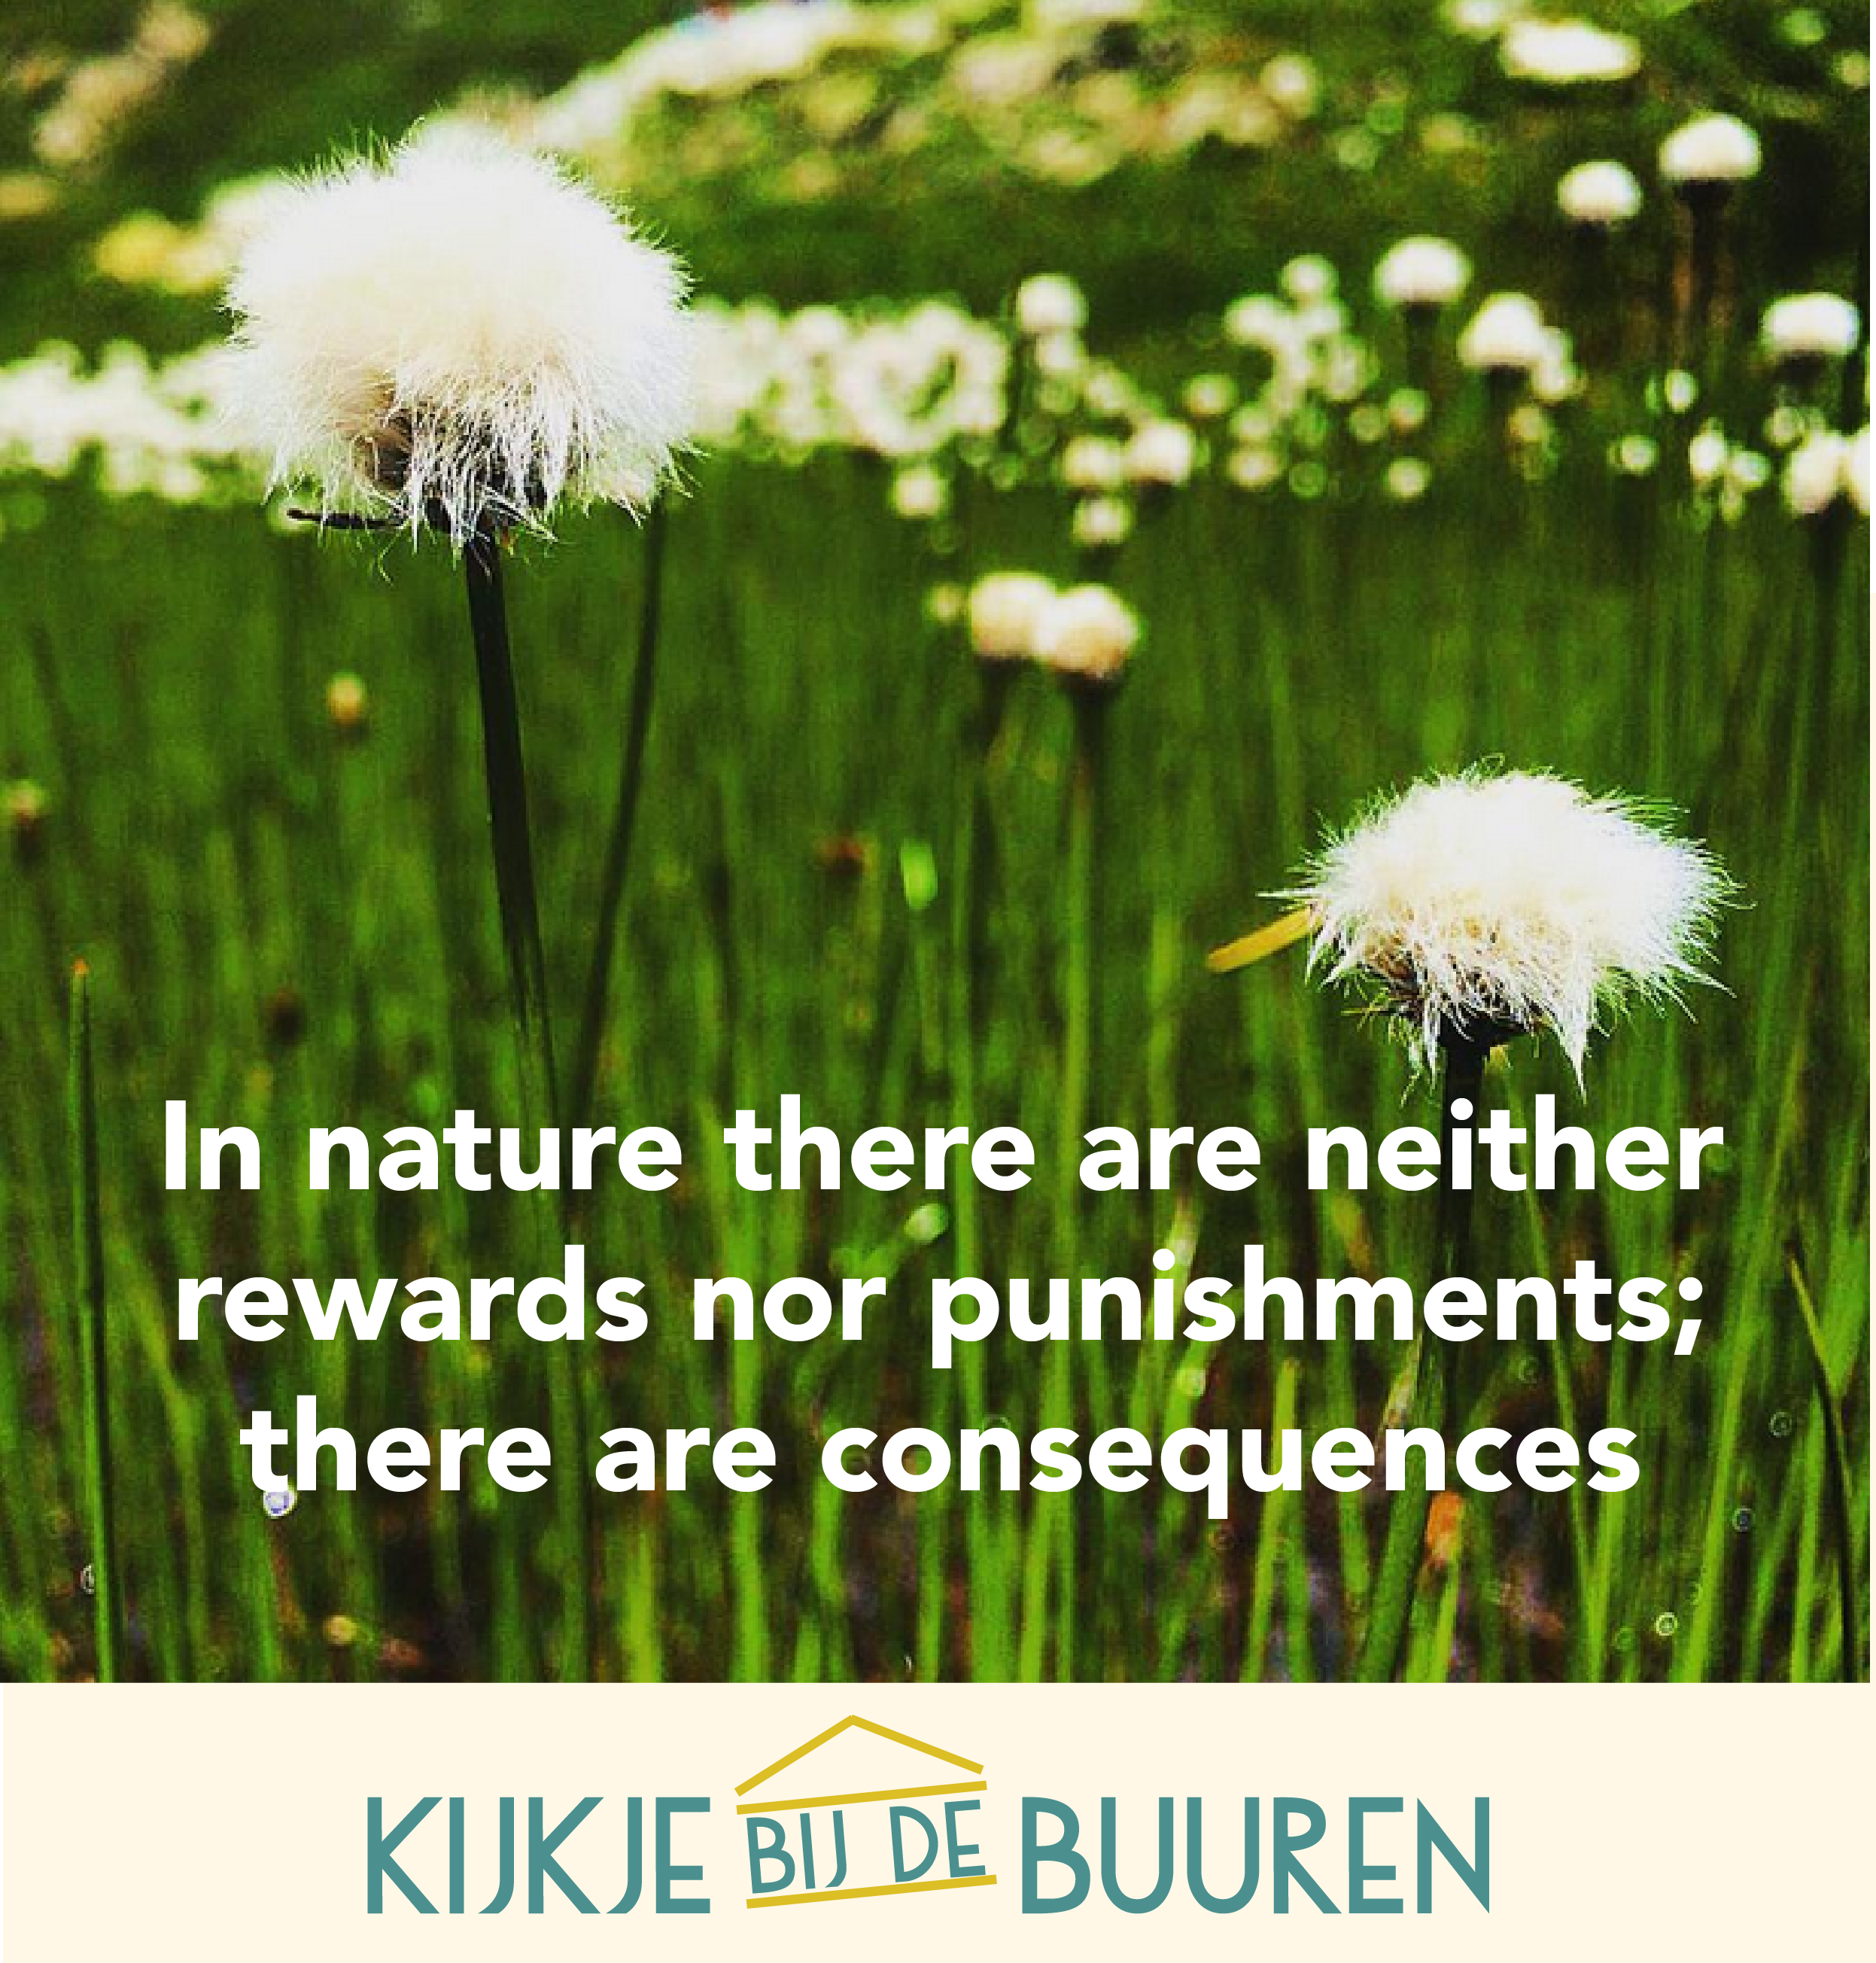 Citaten Over Natuur : Natuur quote nature flowers inspirerende quotes over